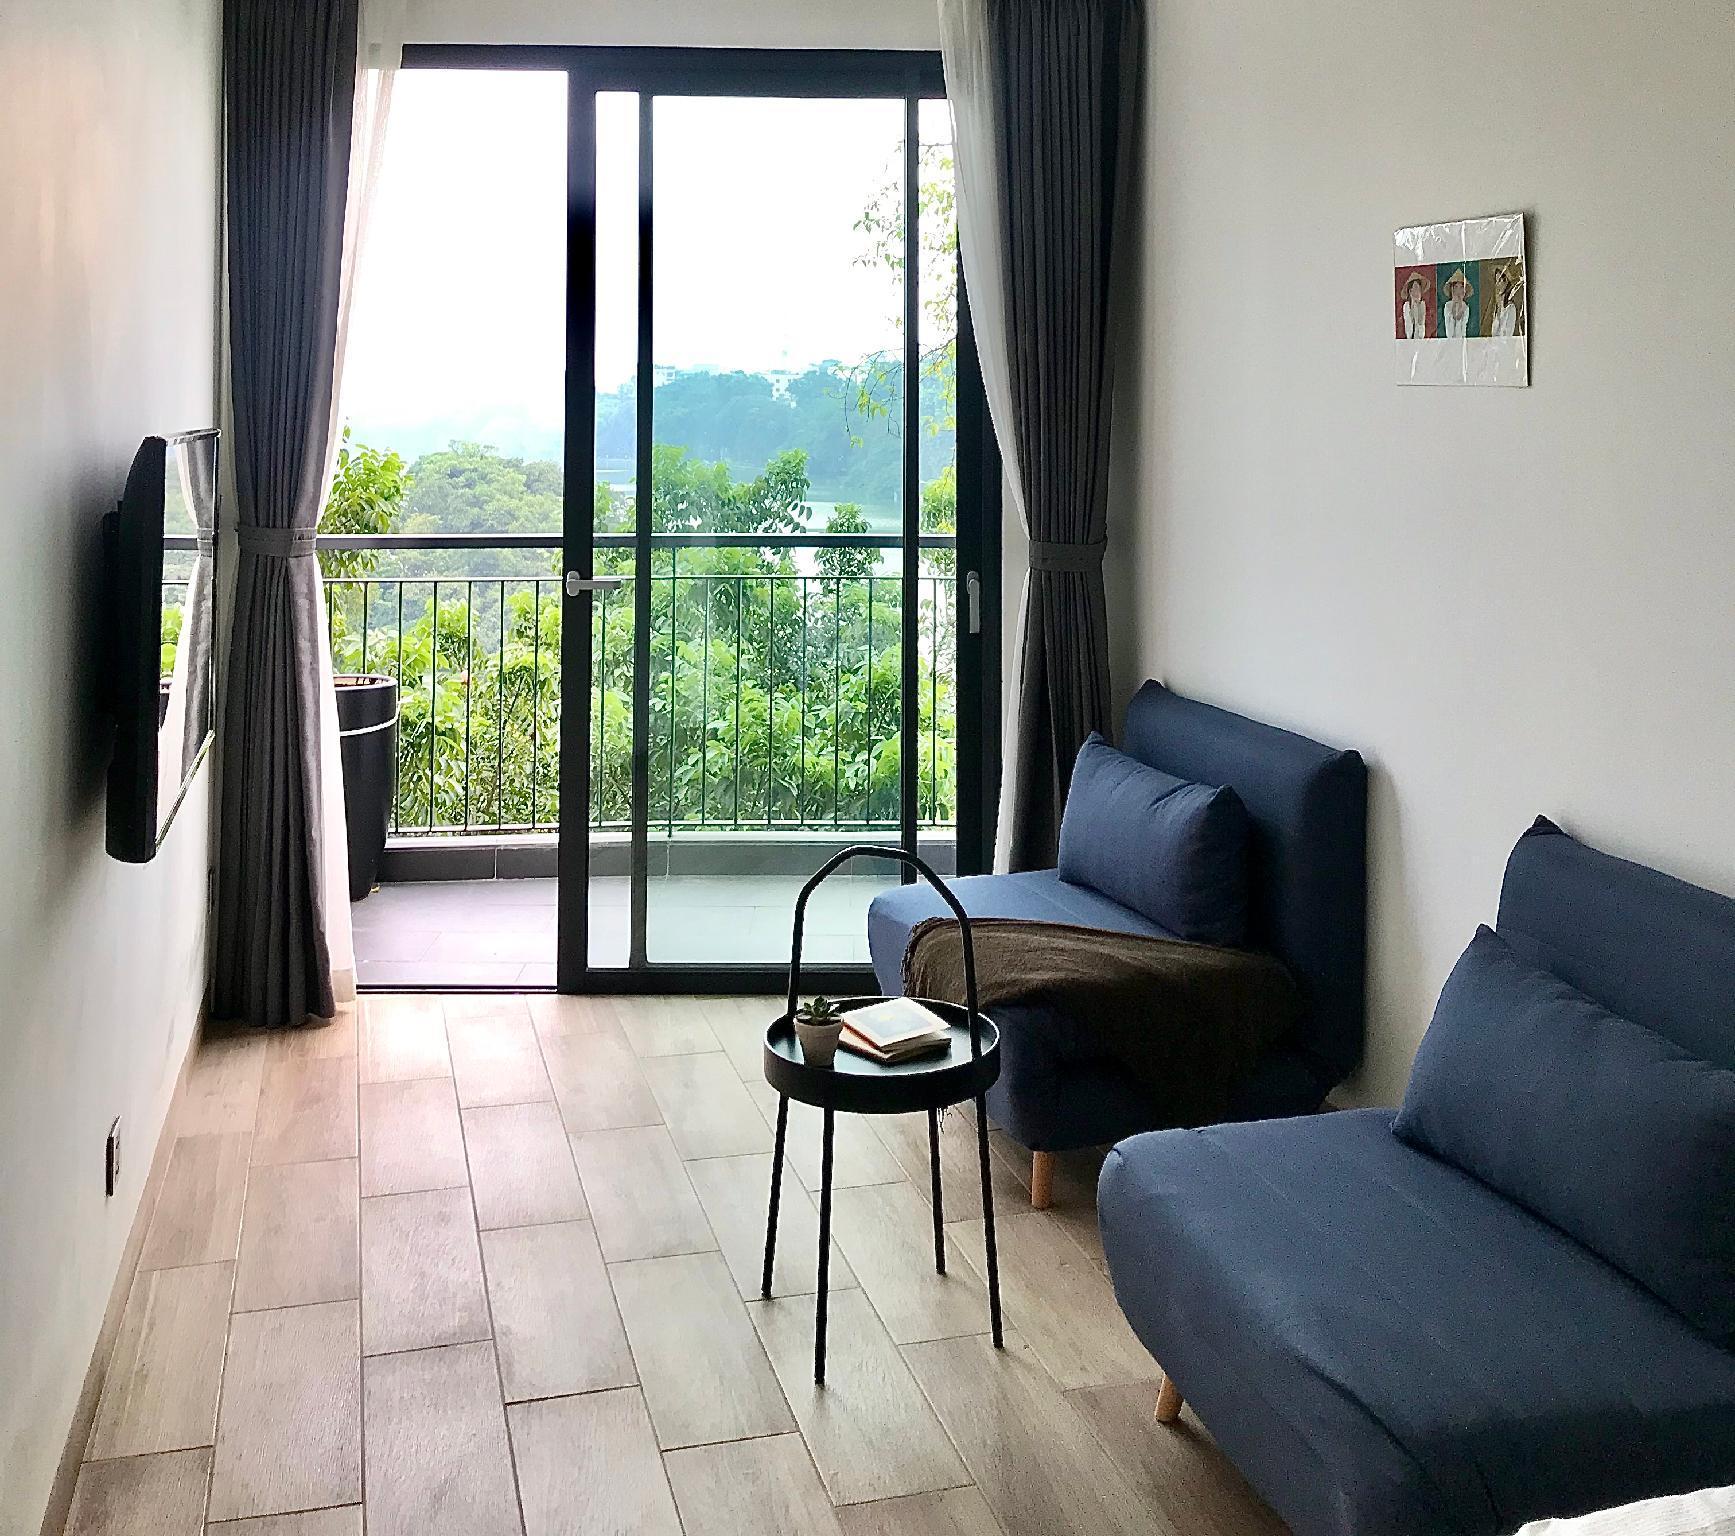 Studio Apt. V On HOAN KIEM LAKE Balcony And Rooftop